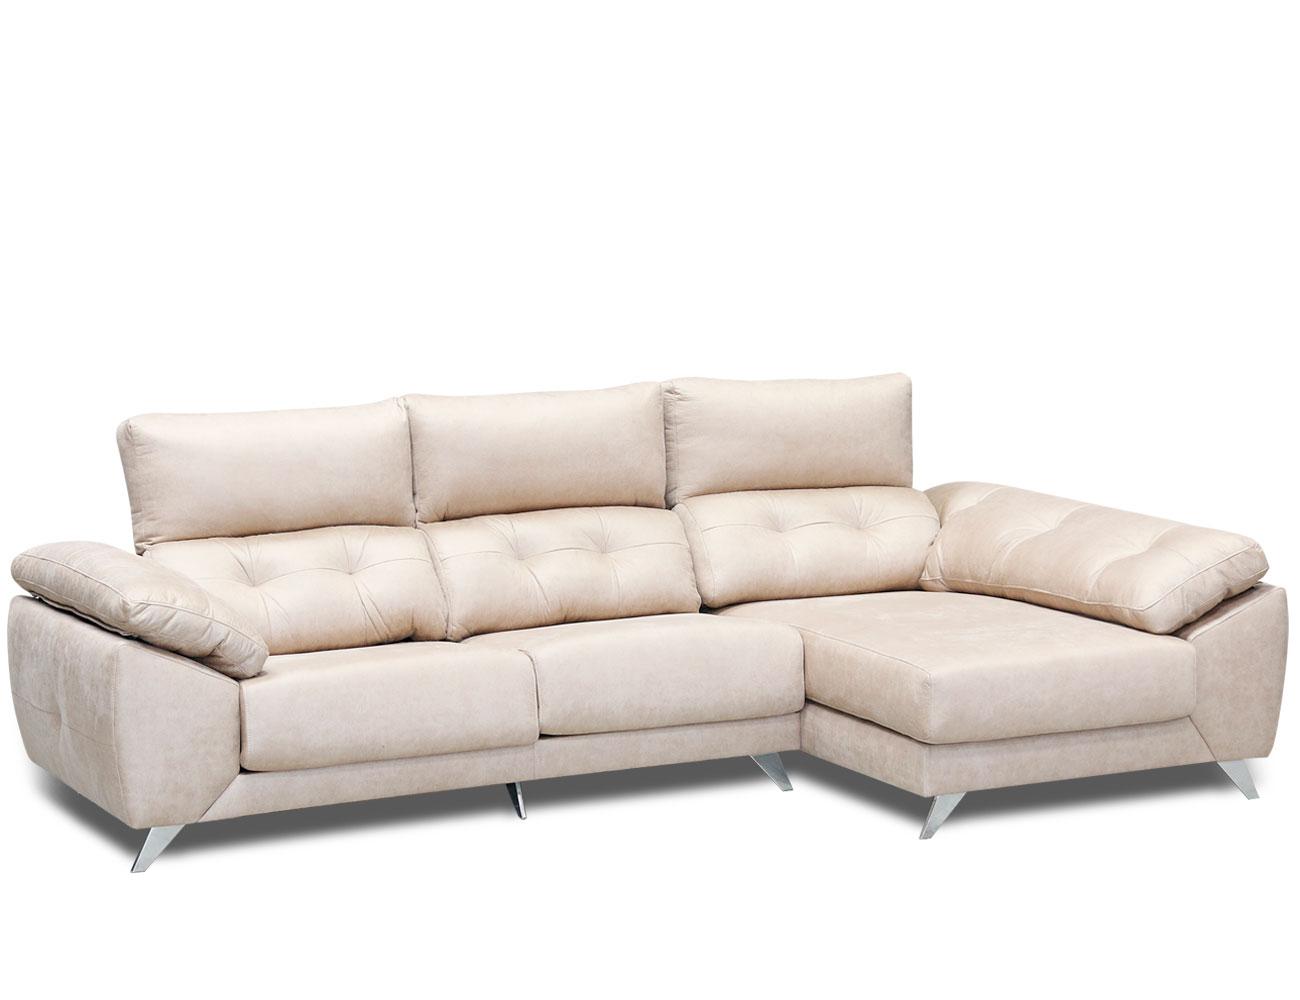 Sofa chaiselongue capitone anti machas gama alta